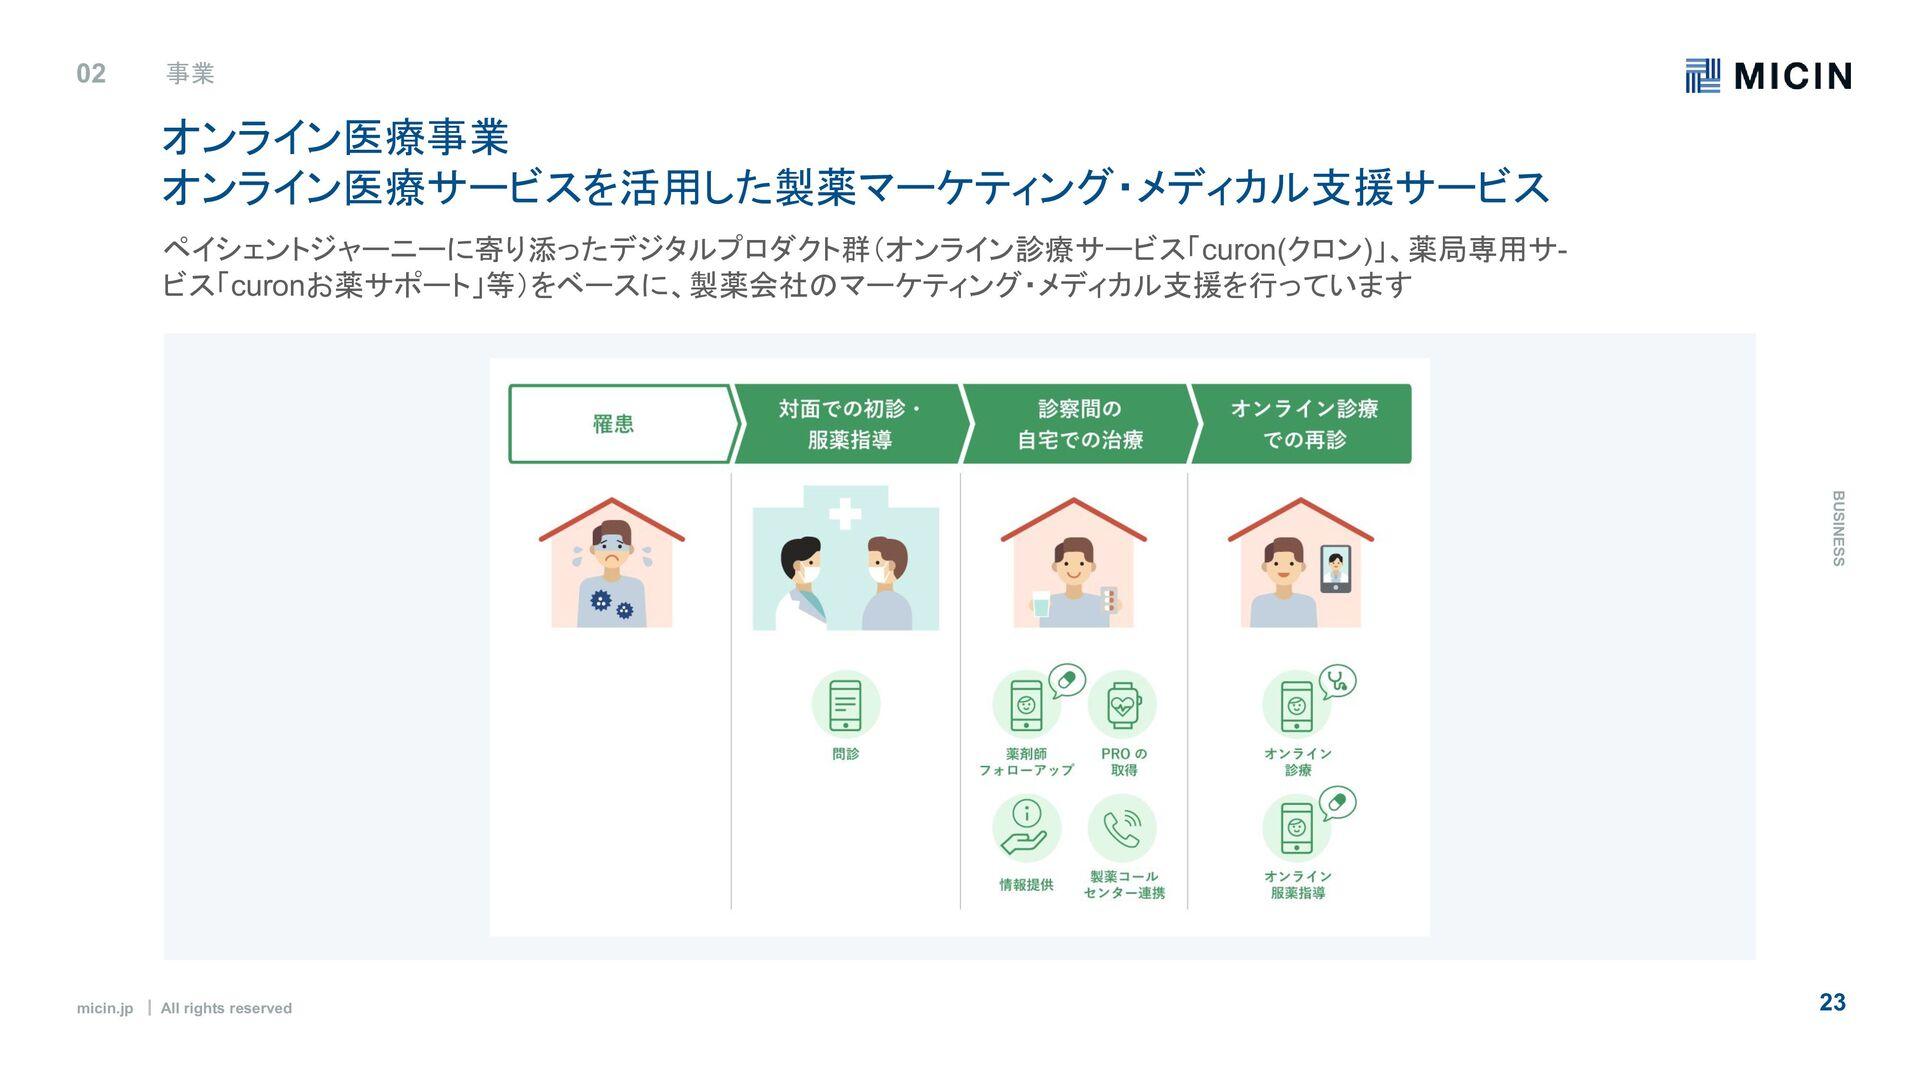 micin.jp   All rights reserved 23 組織の特徴:5つのバリュー...